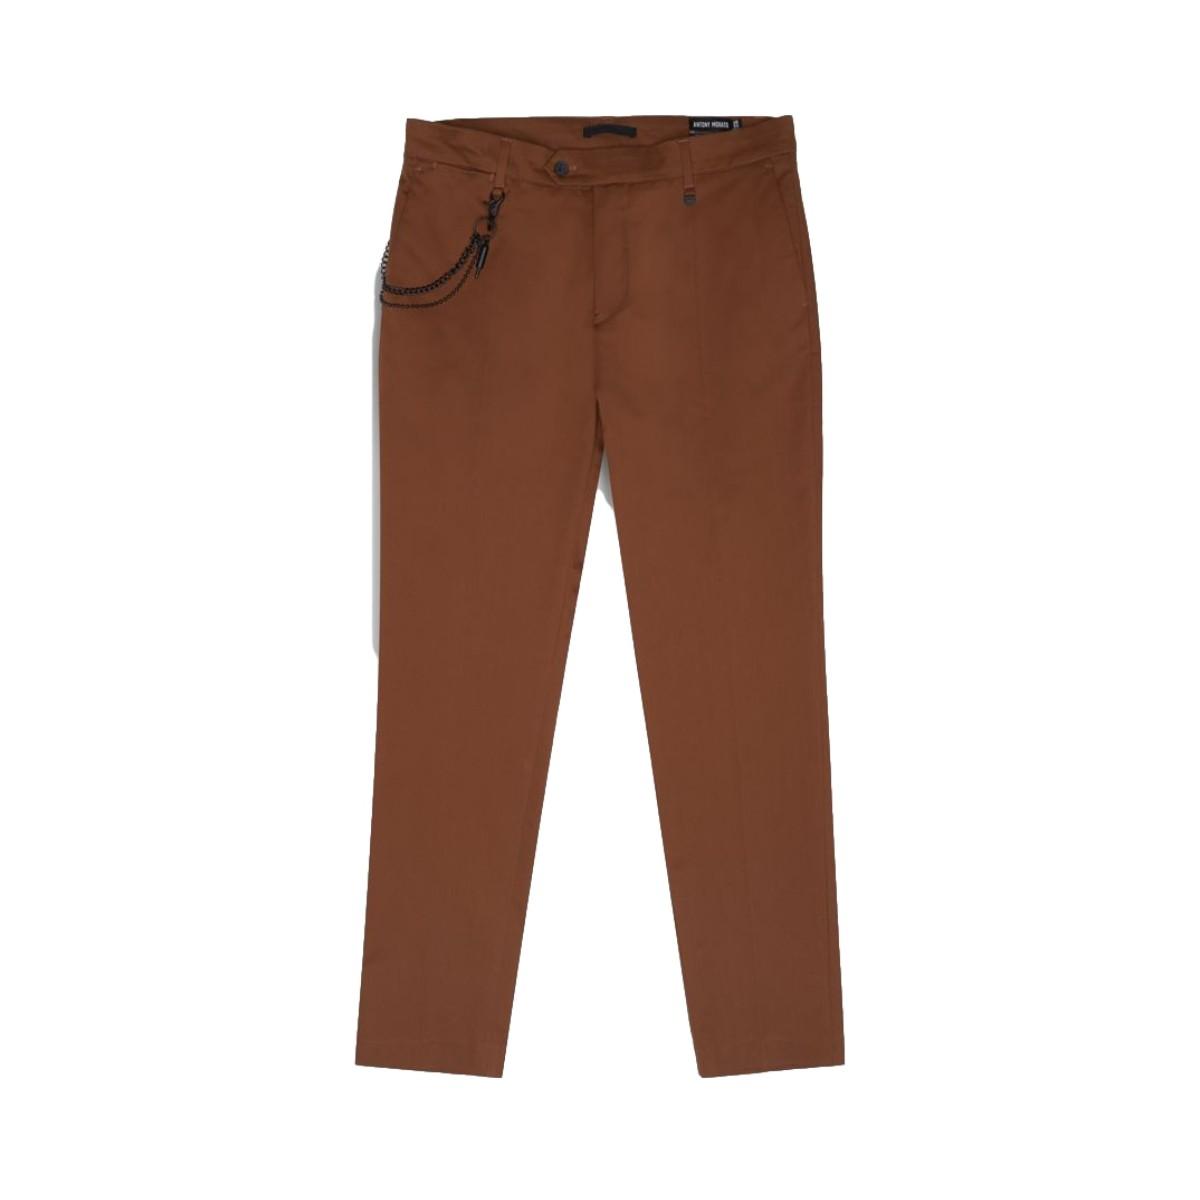 Antony Morato Jagger Rust Brown MMTR00625-FA8001148-2084